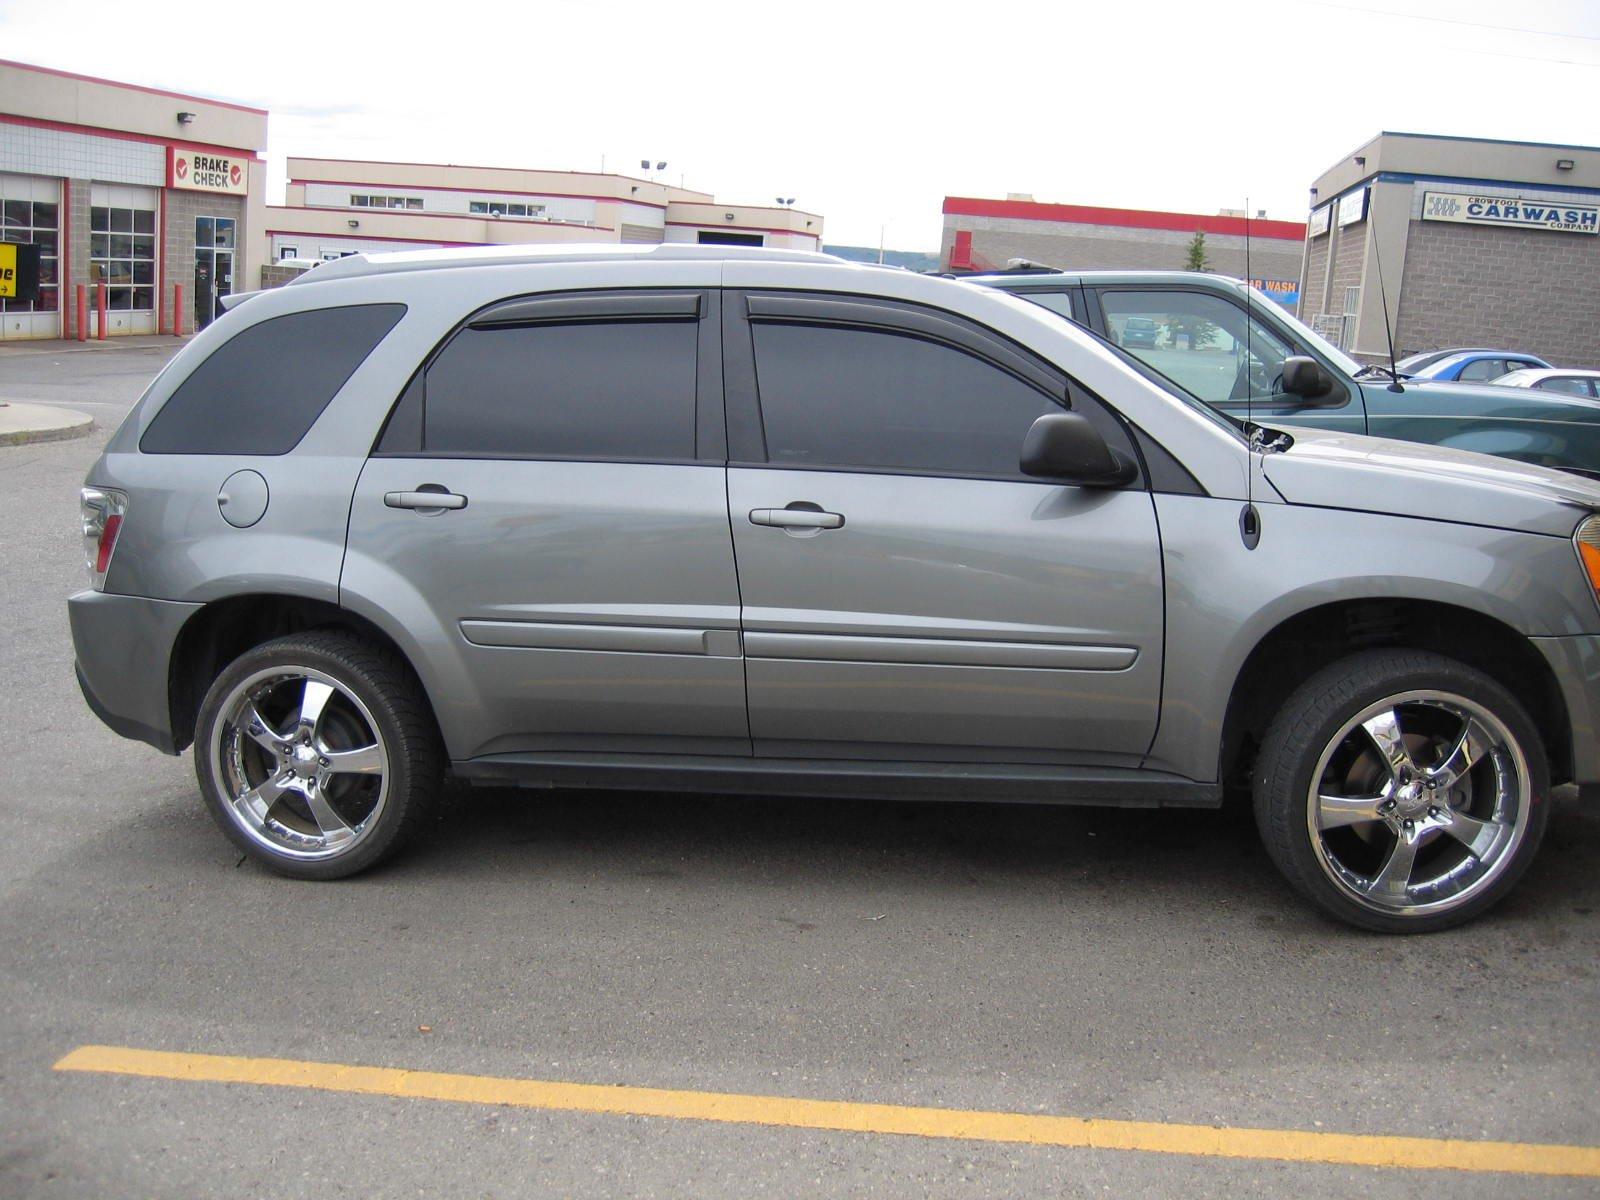 Chevrolet Cavalier Problems 2005 Chevrolet Cavalier